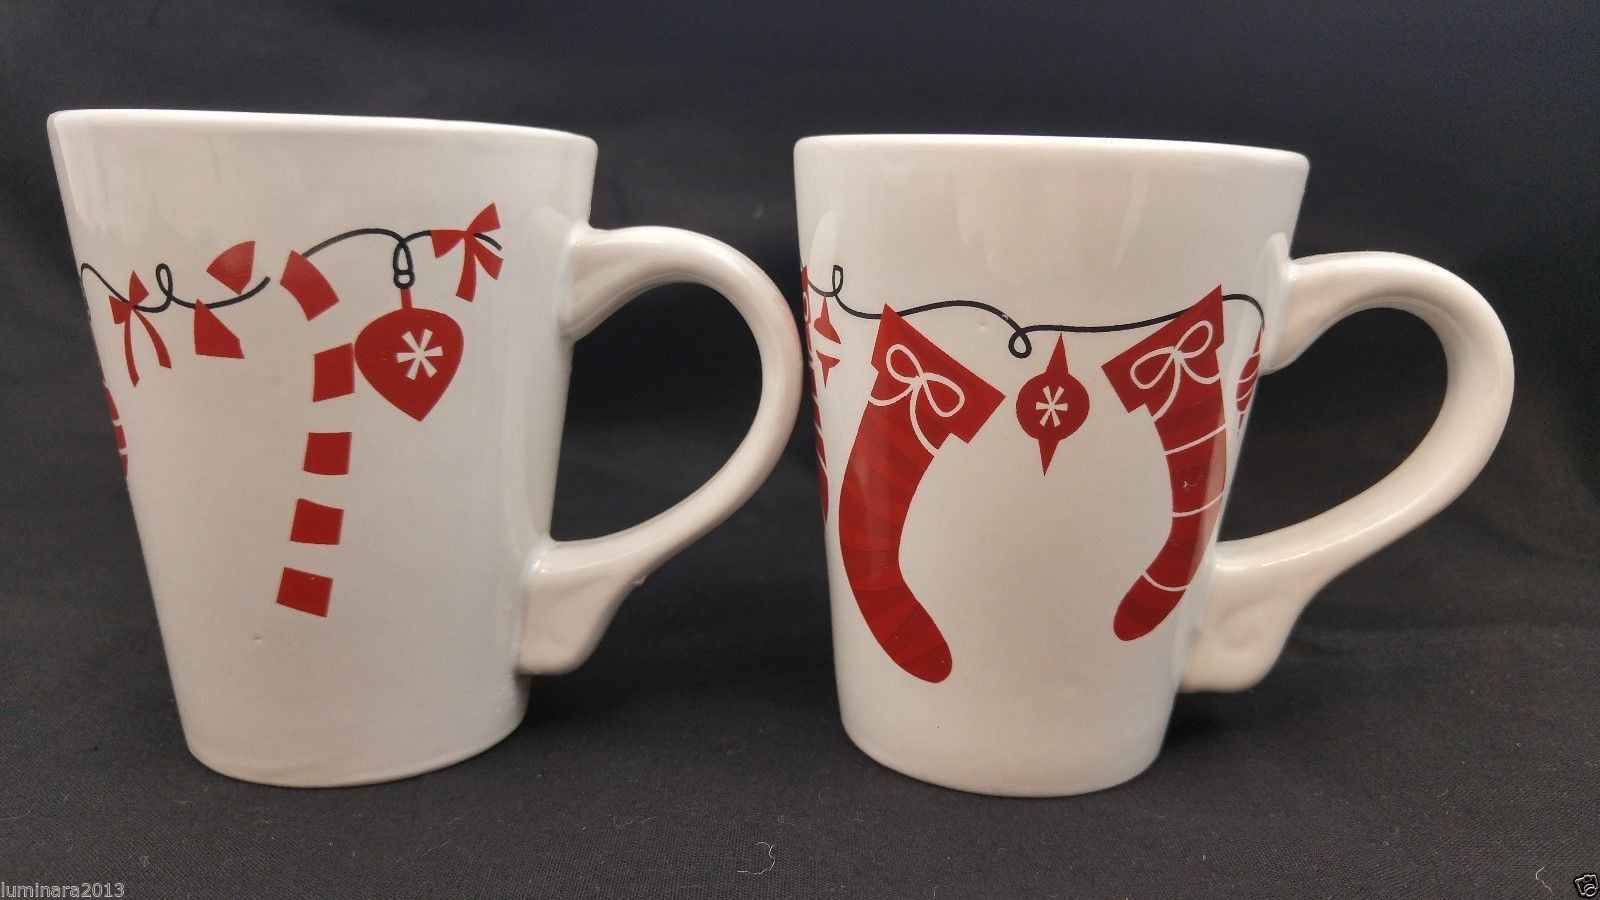 California Pantry Mug (2000s): 13 listings